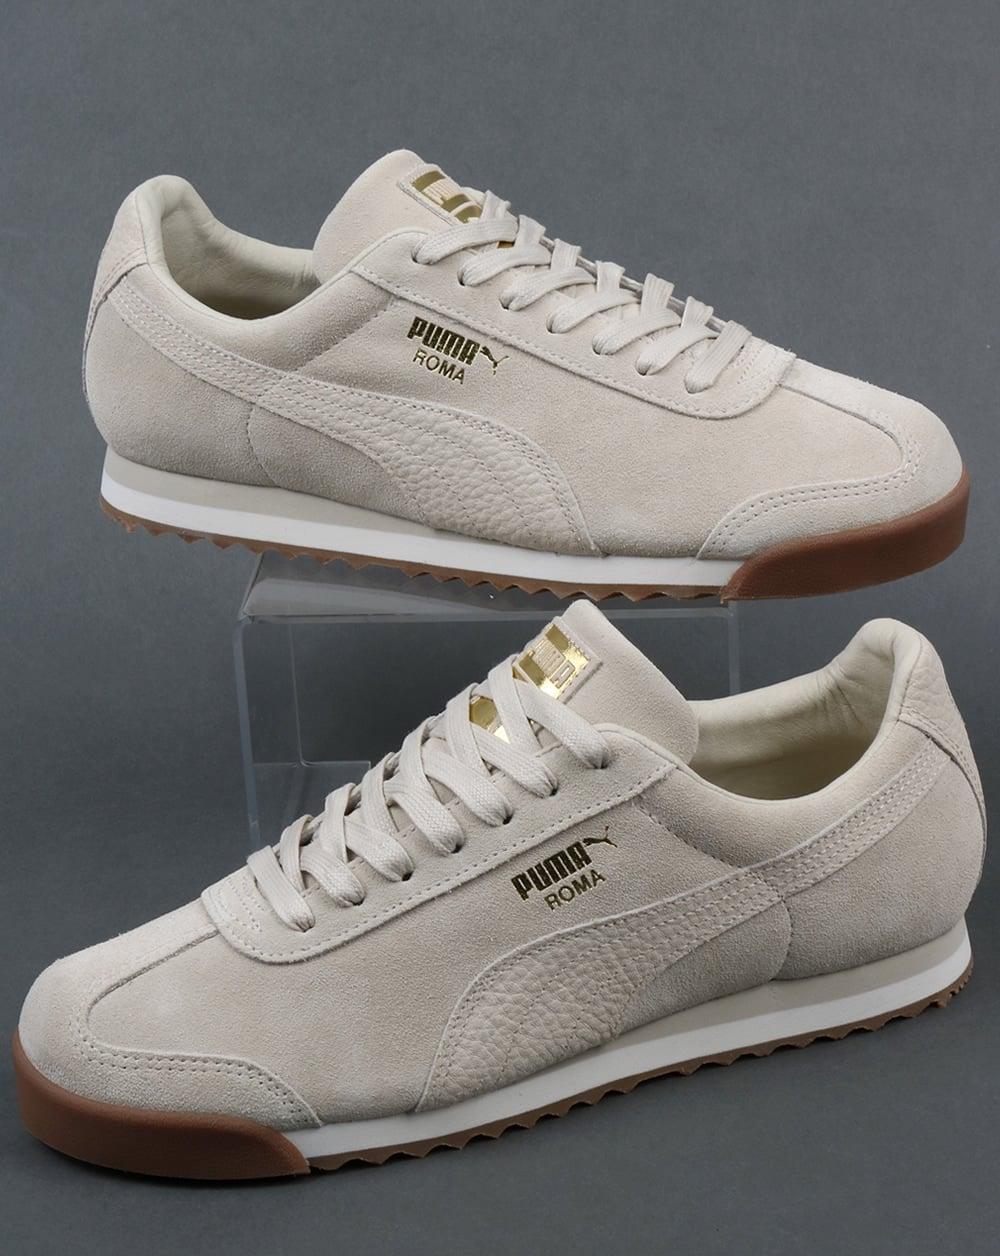 84e357e83a6de0 Puma Puma Roma Trainers premium off white